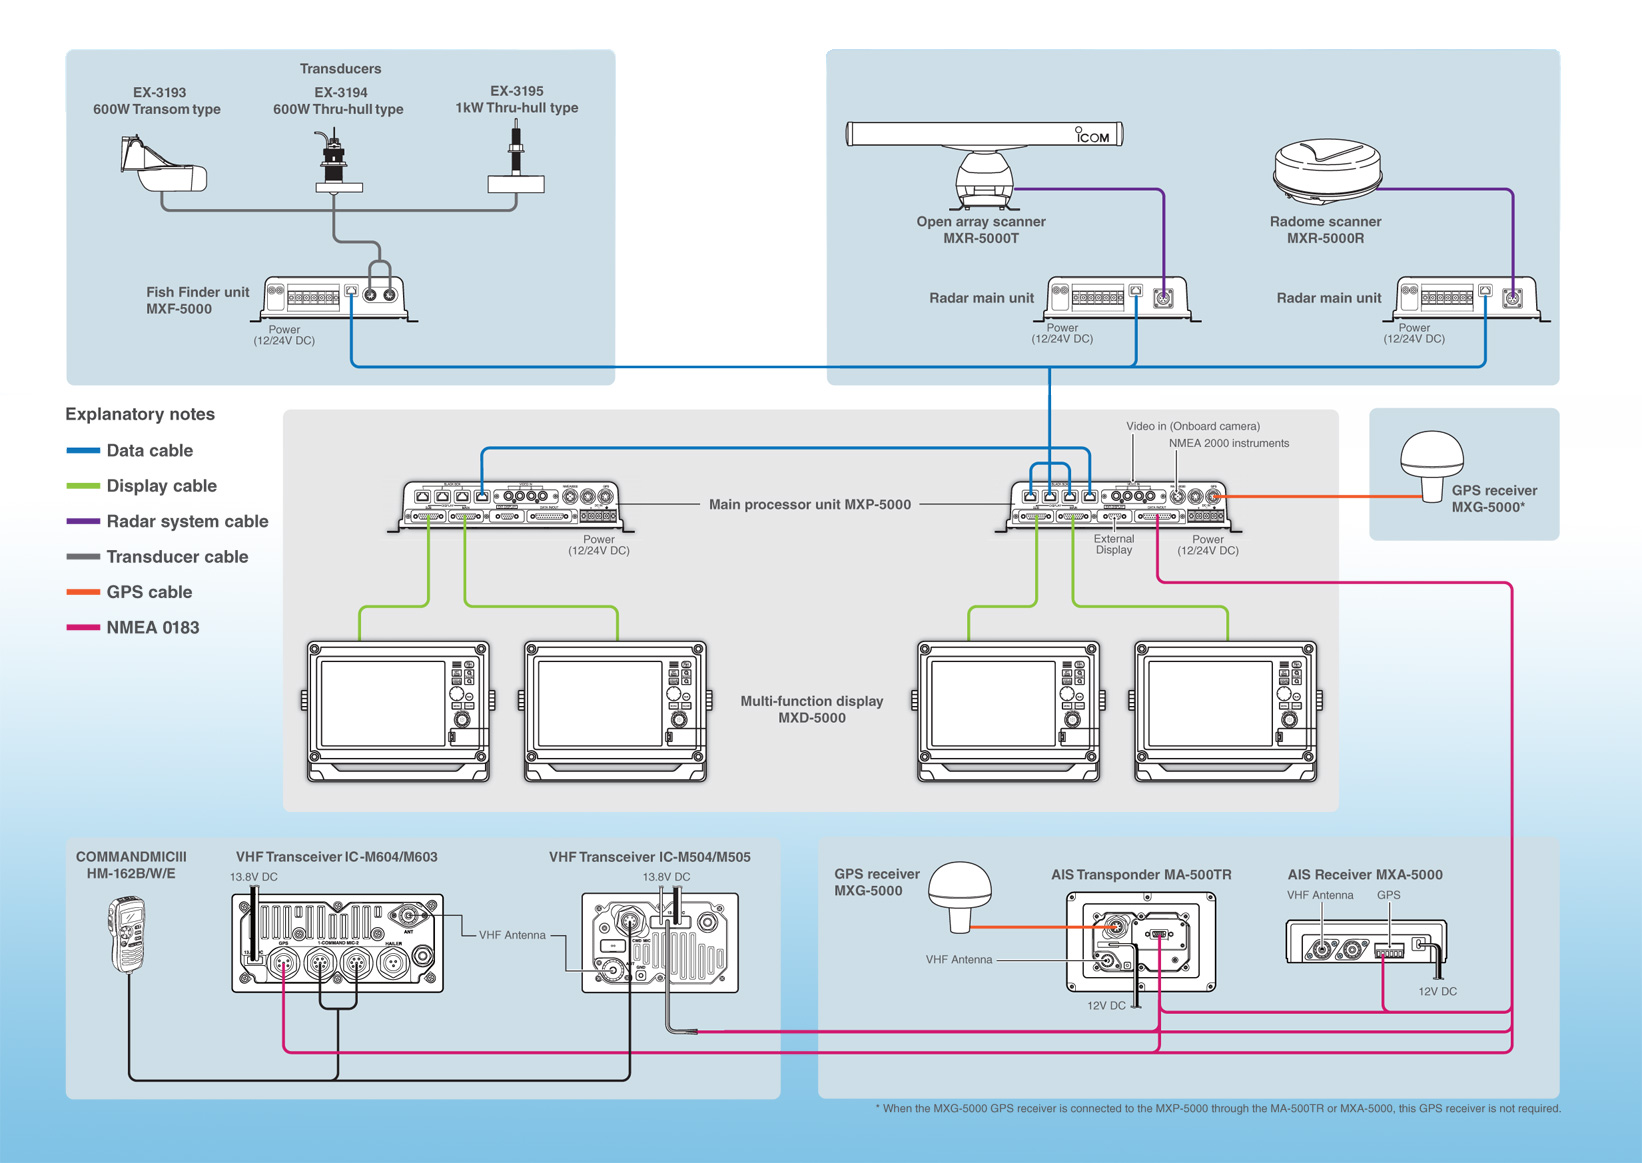 Ais Gps Wiring Diagram Auto Electrical For A Standard Horizon Vhf Radio